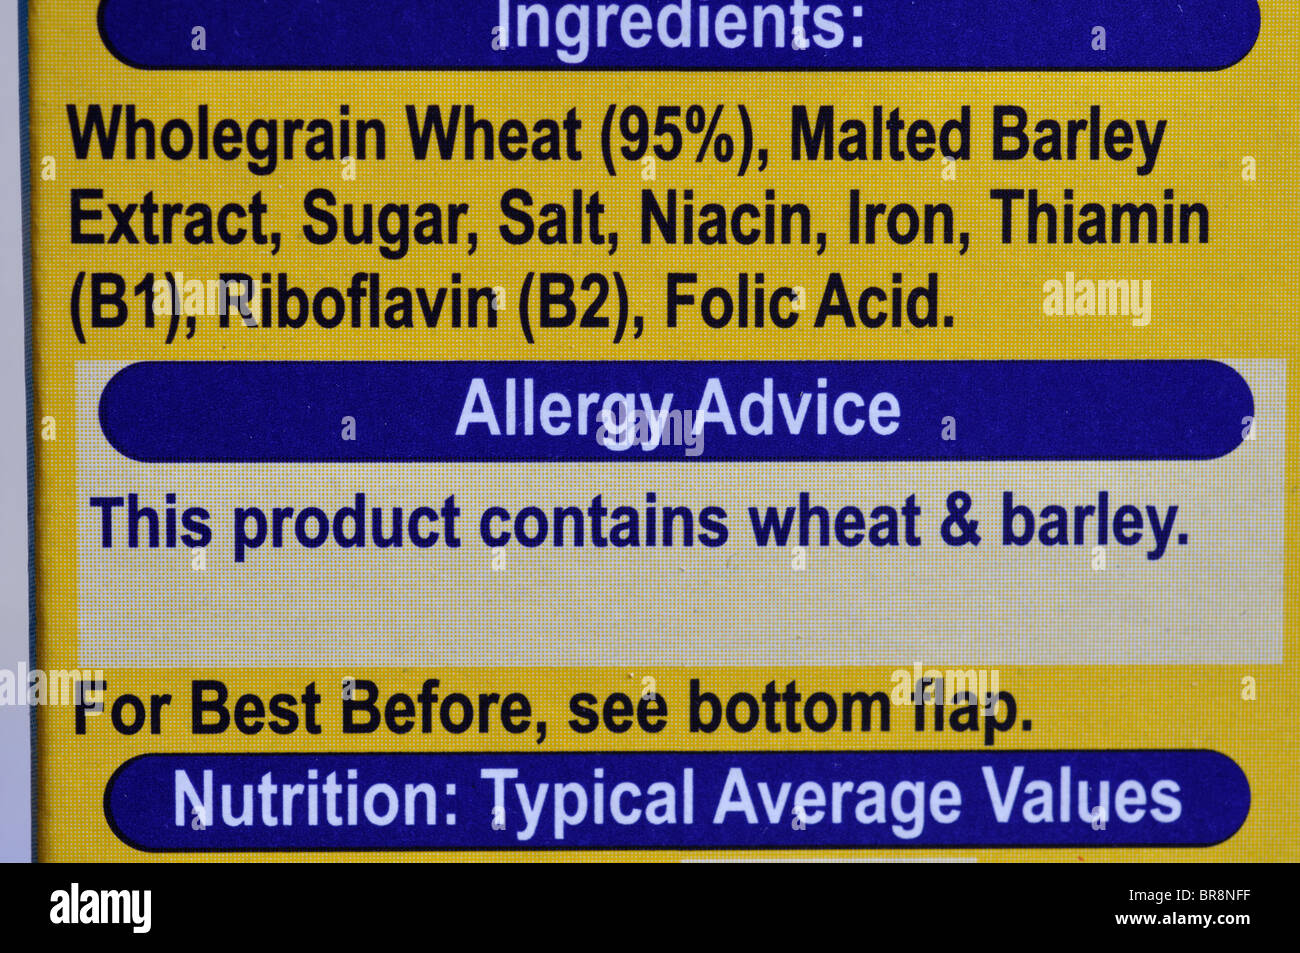 Conseils d'allergie sur les emballages alimentaires Photo Stock